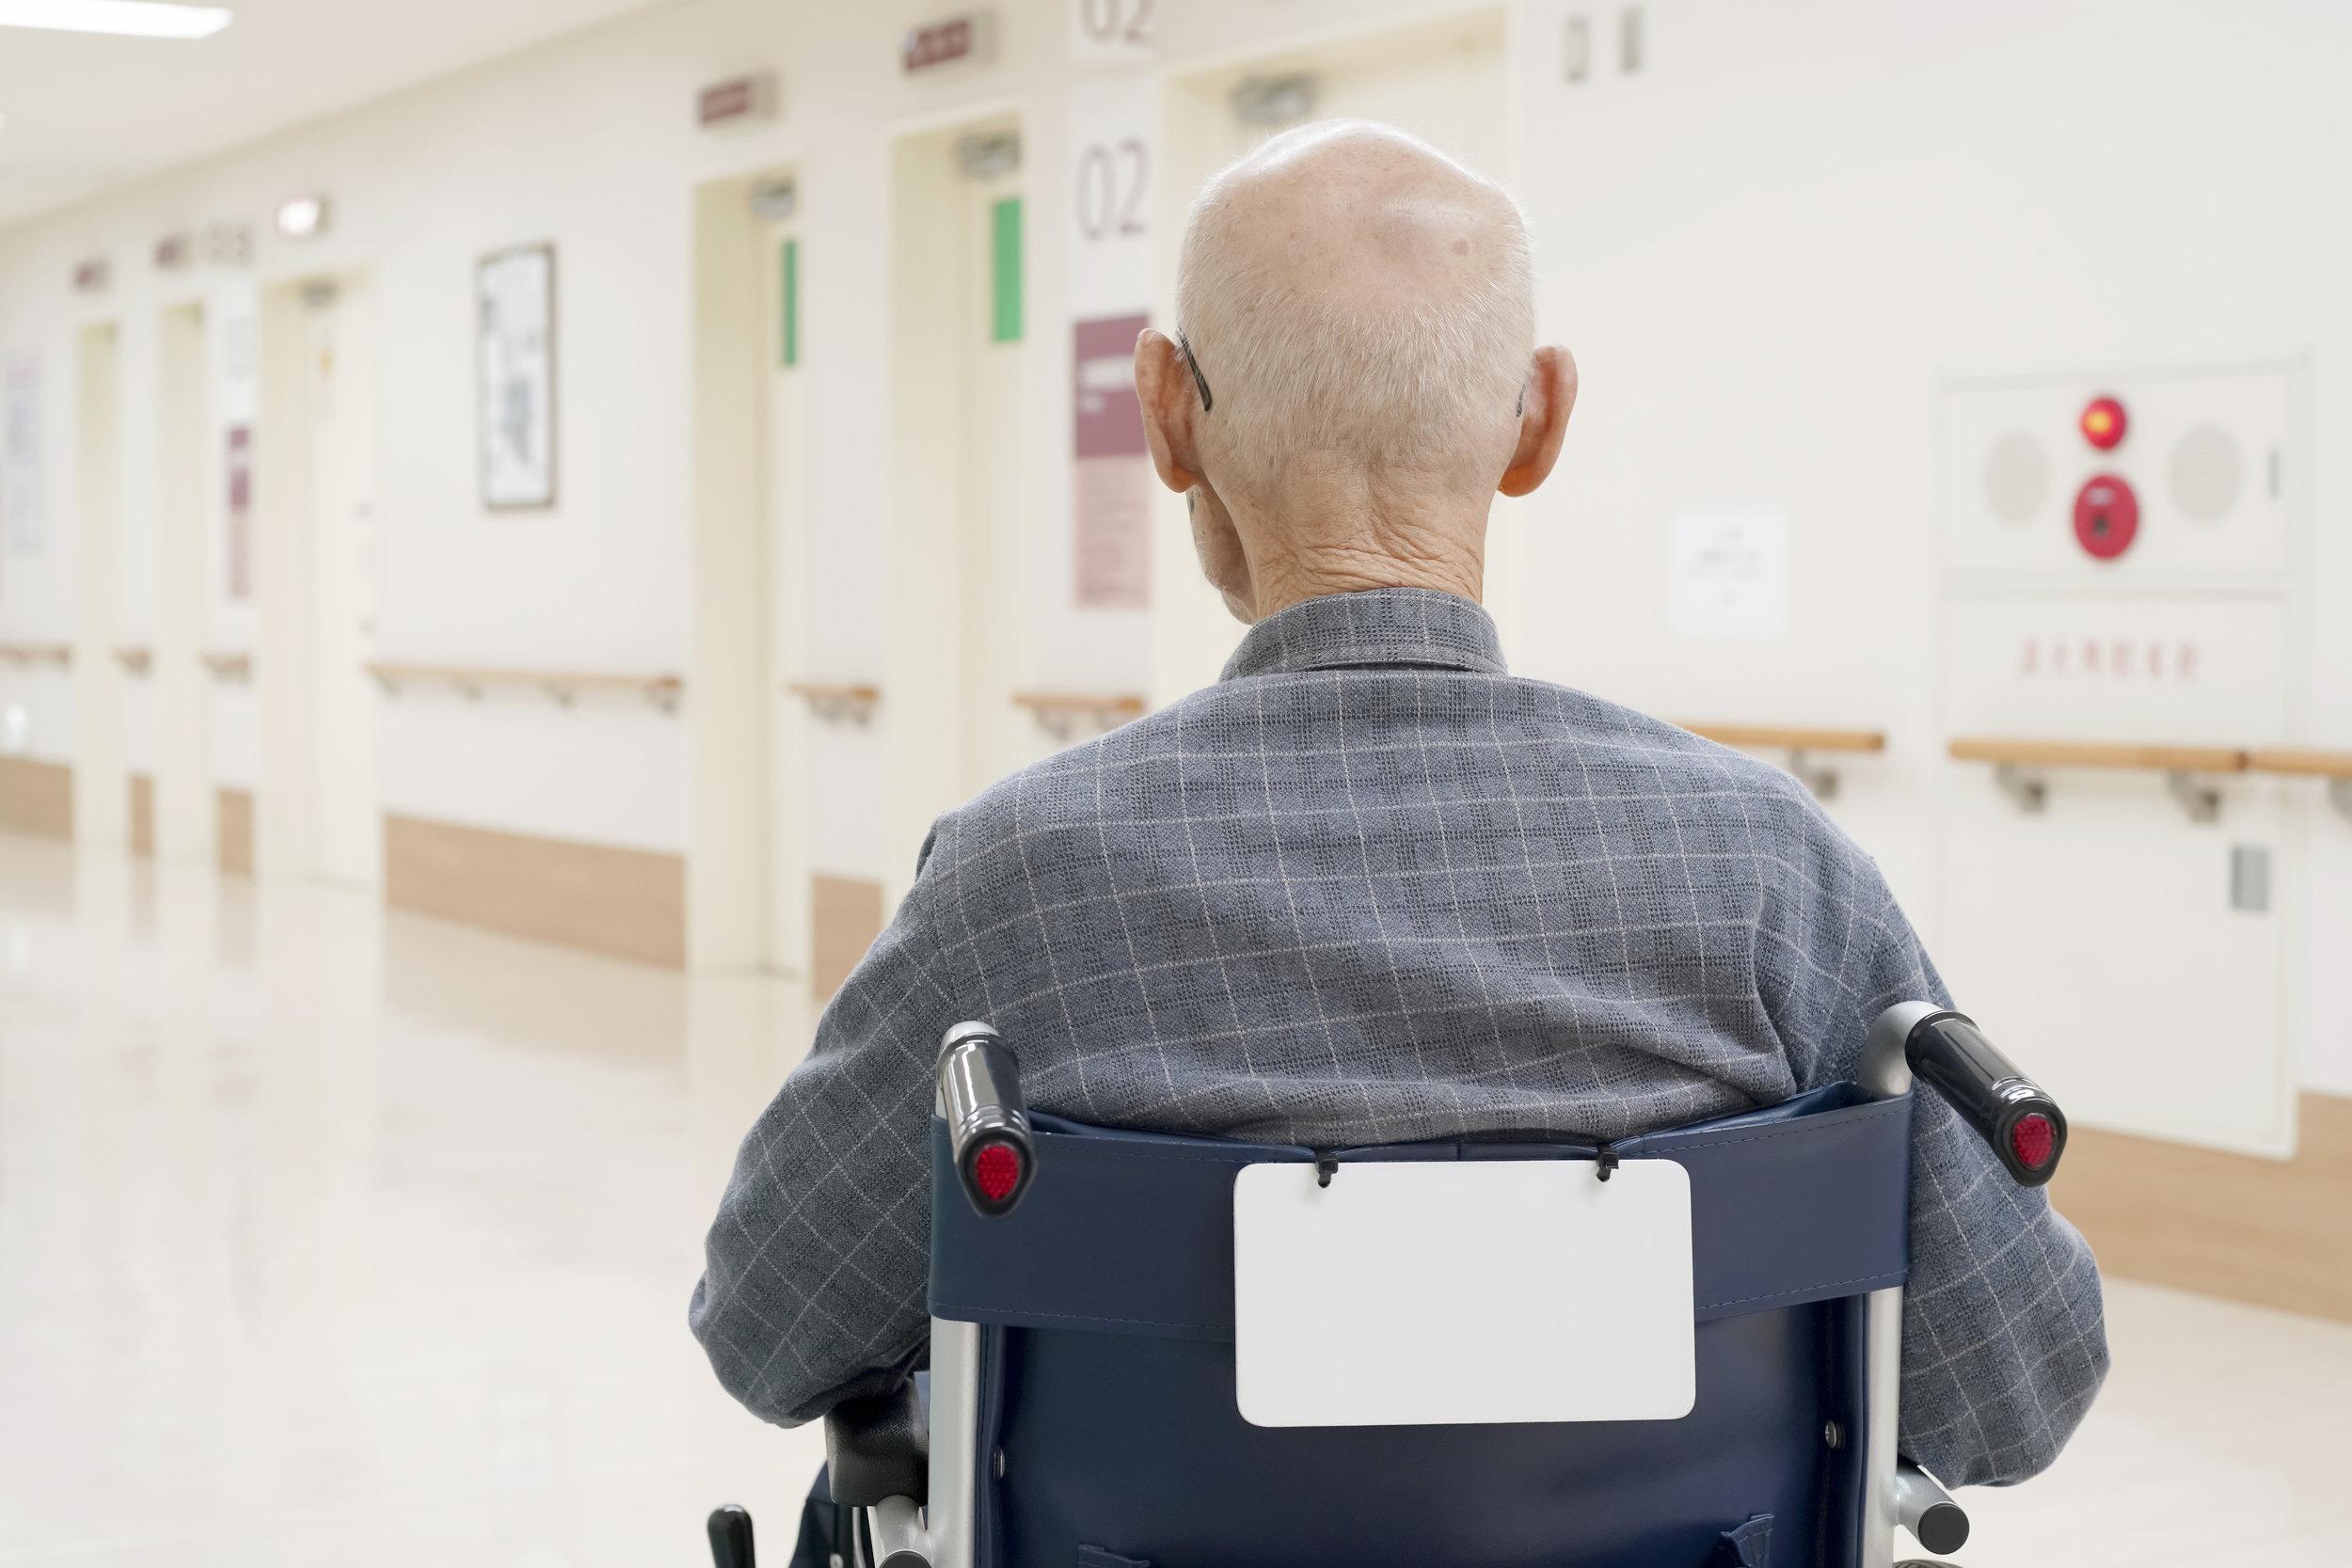 nursing home tulsa okalhoma best nursing home in tulsa oxford home healthcare tulsa oklahoma alternative to nursing home.jpg